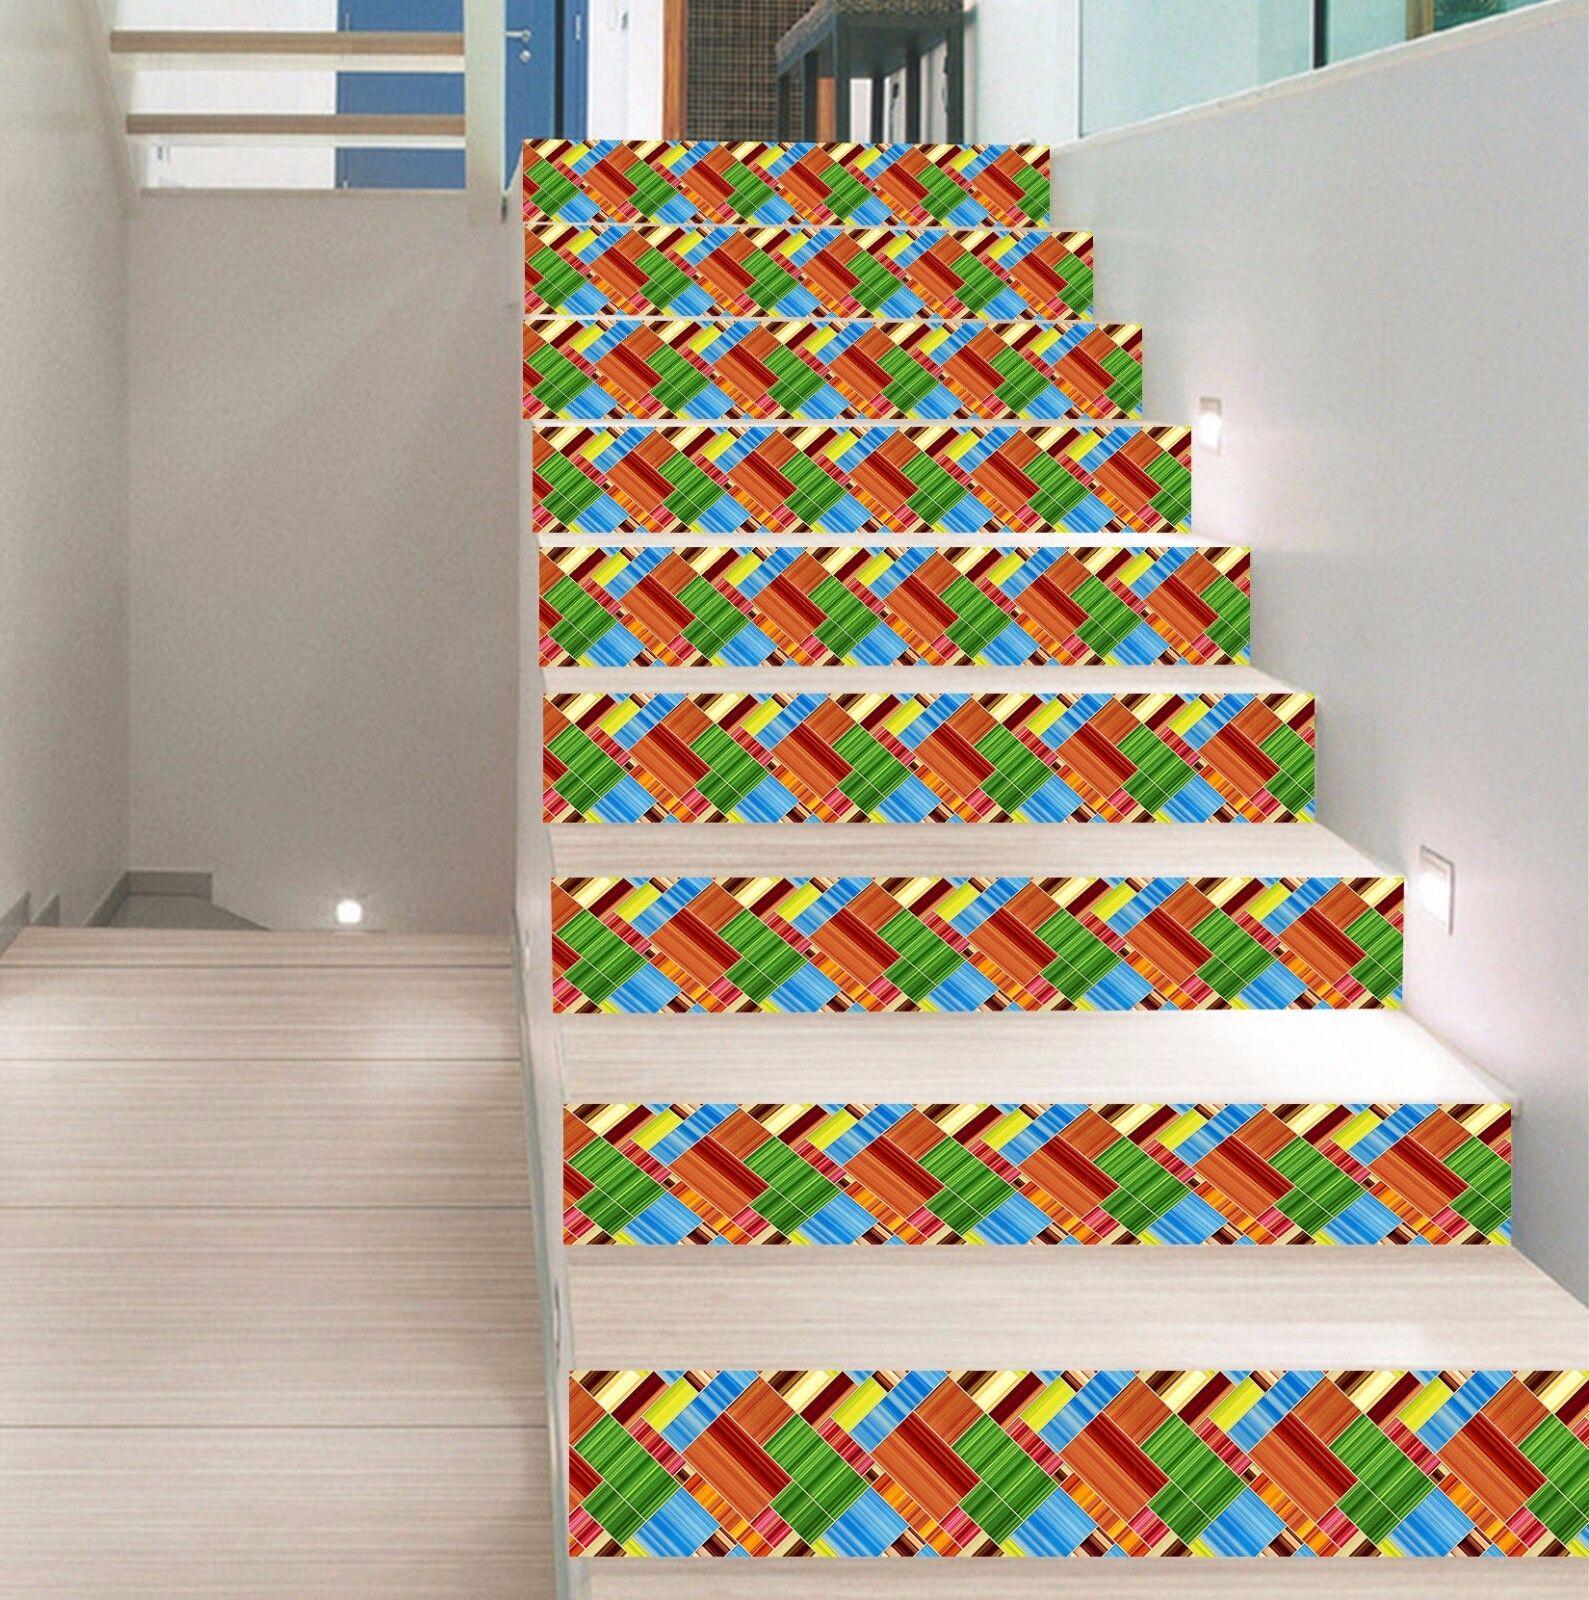 3D Plaid Muster 379 Stair Risers Dekoration Fototapete Vinyl Aufkleber Tapete DE